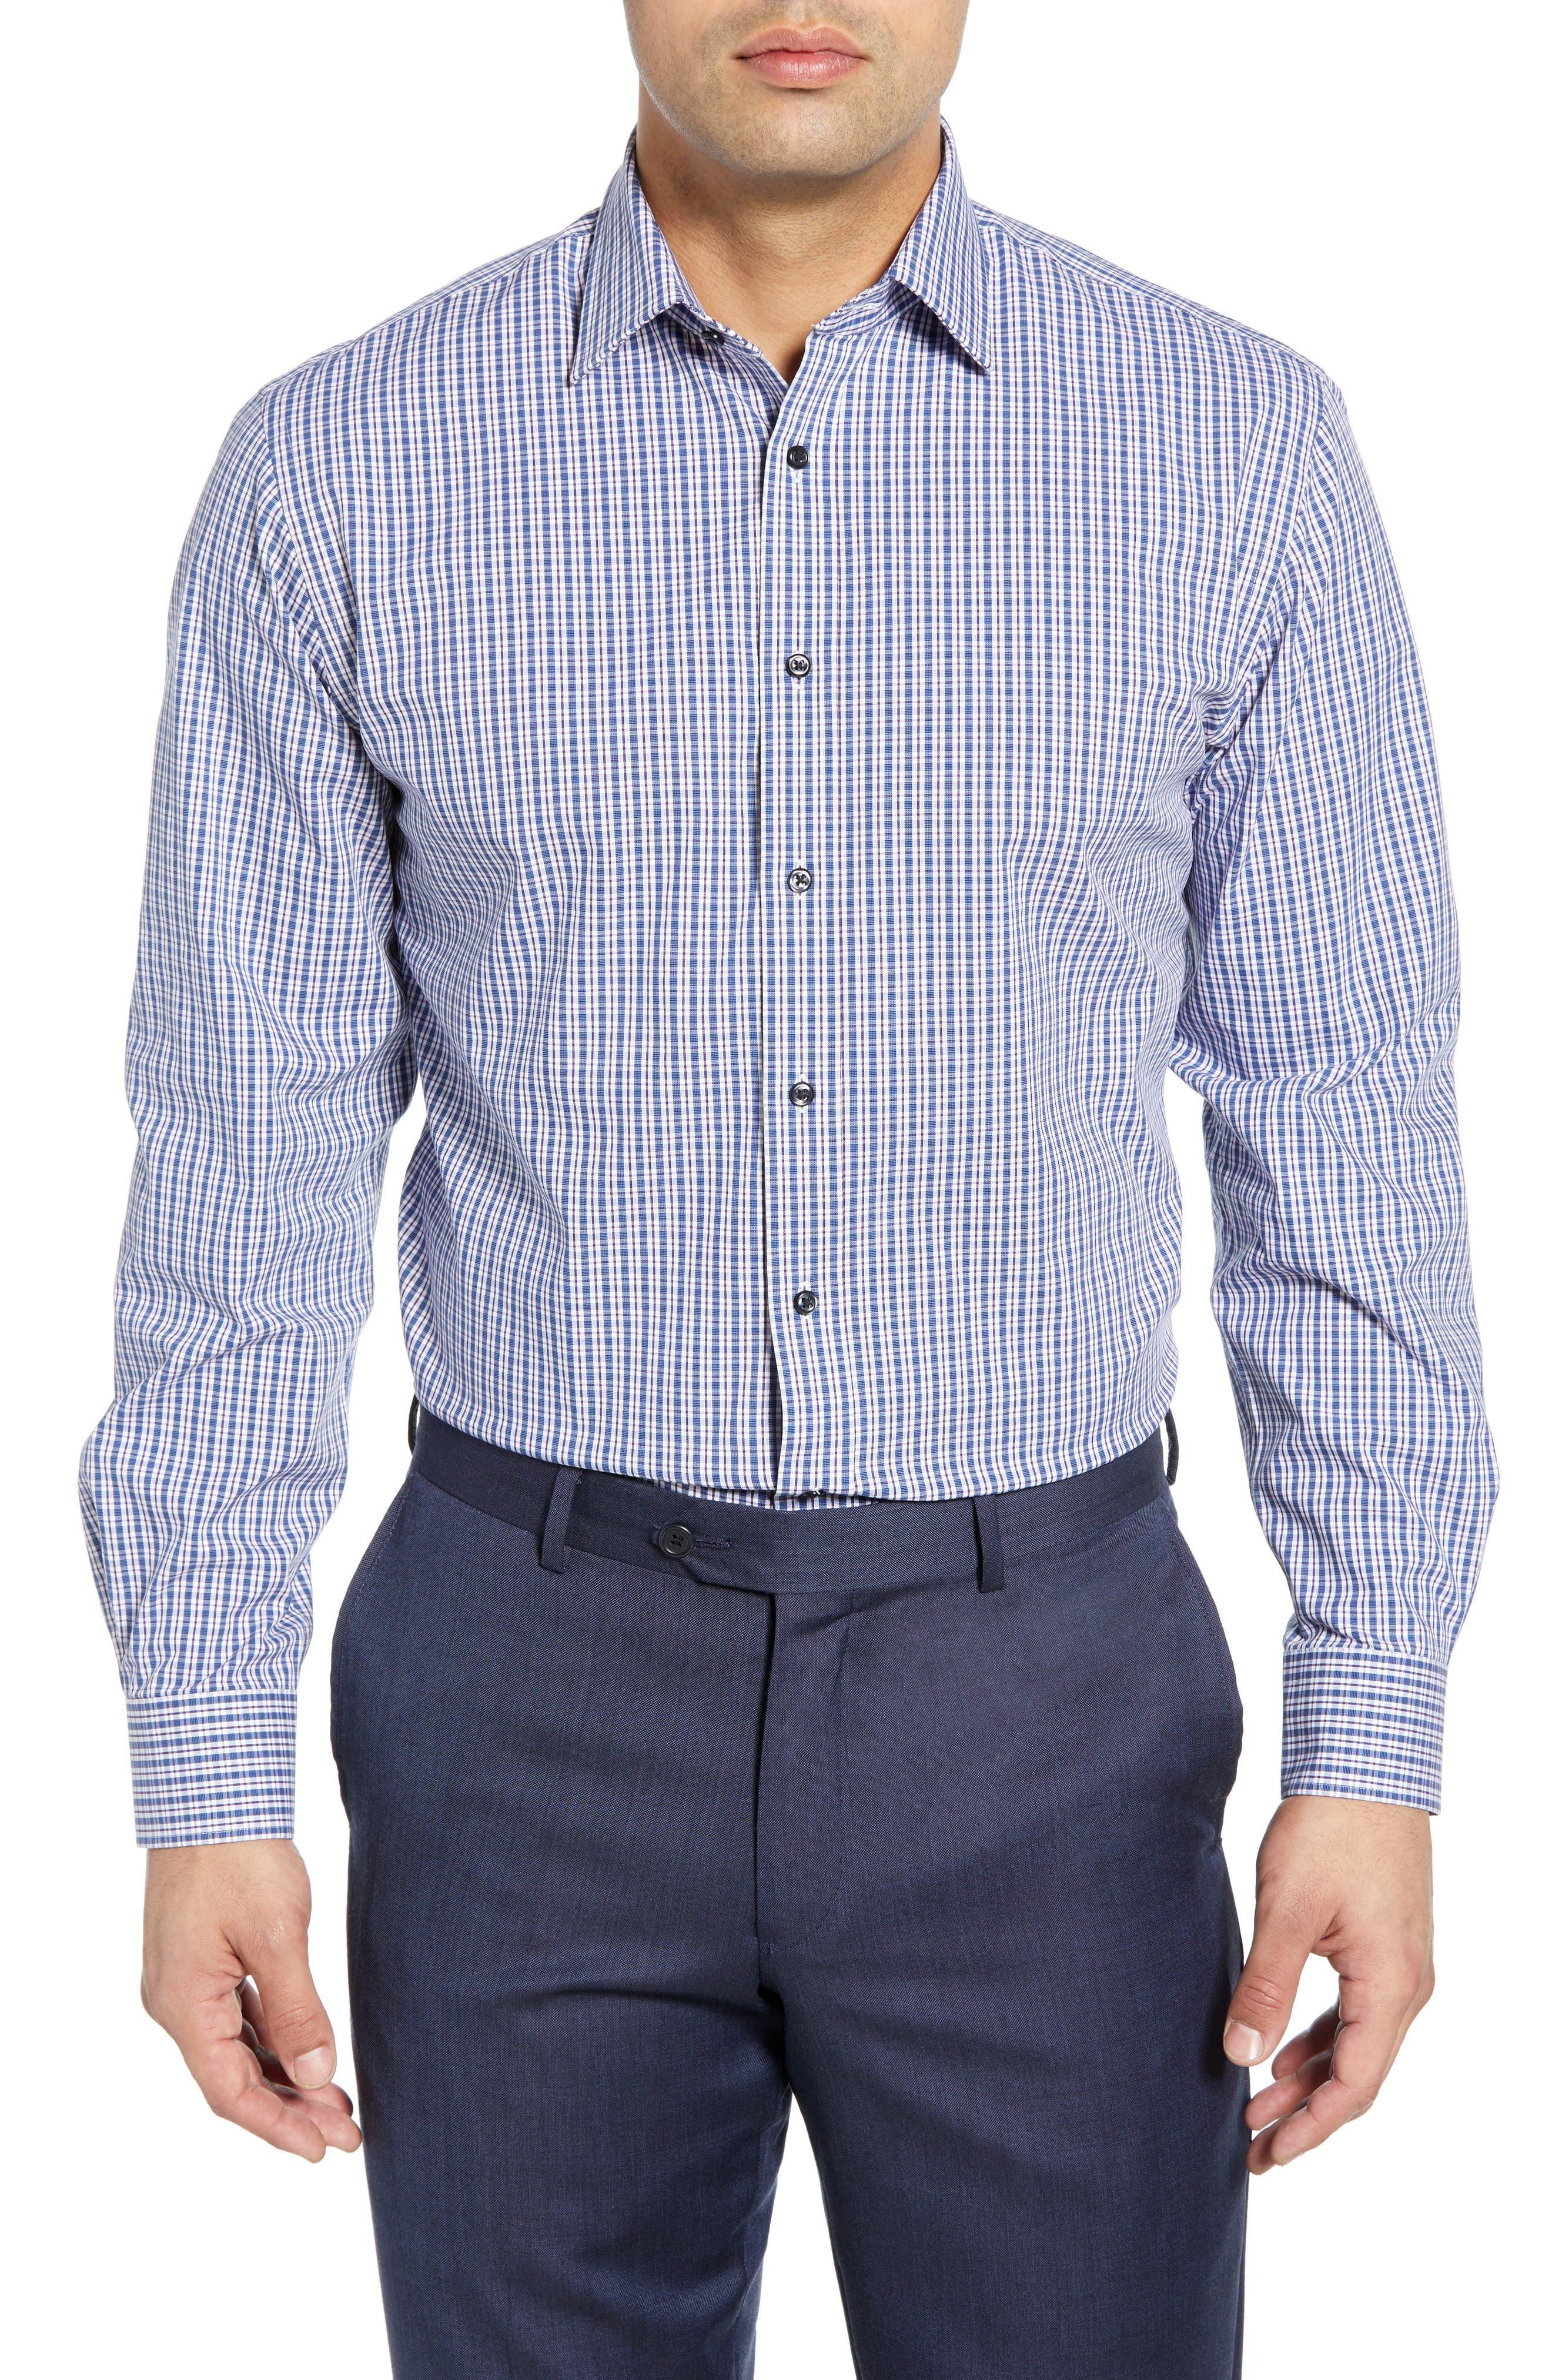 Tech-Smart Traditional Fit Plaid Stretch Dress Shirt, Main, color, NAVY DUSK